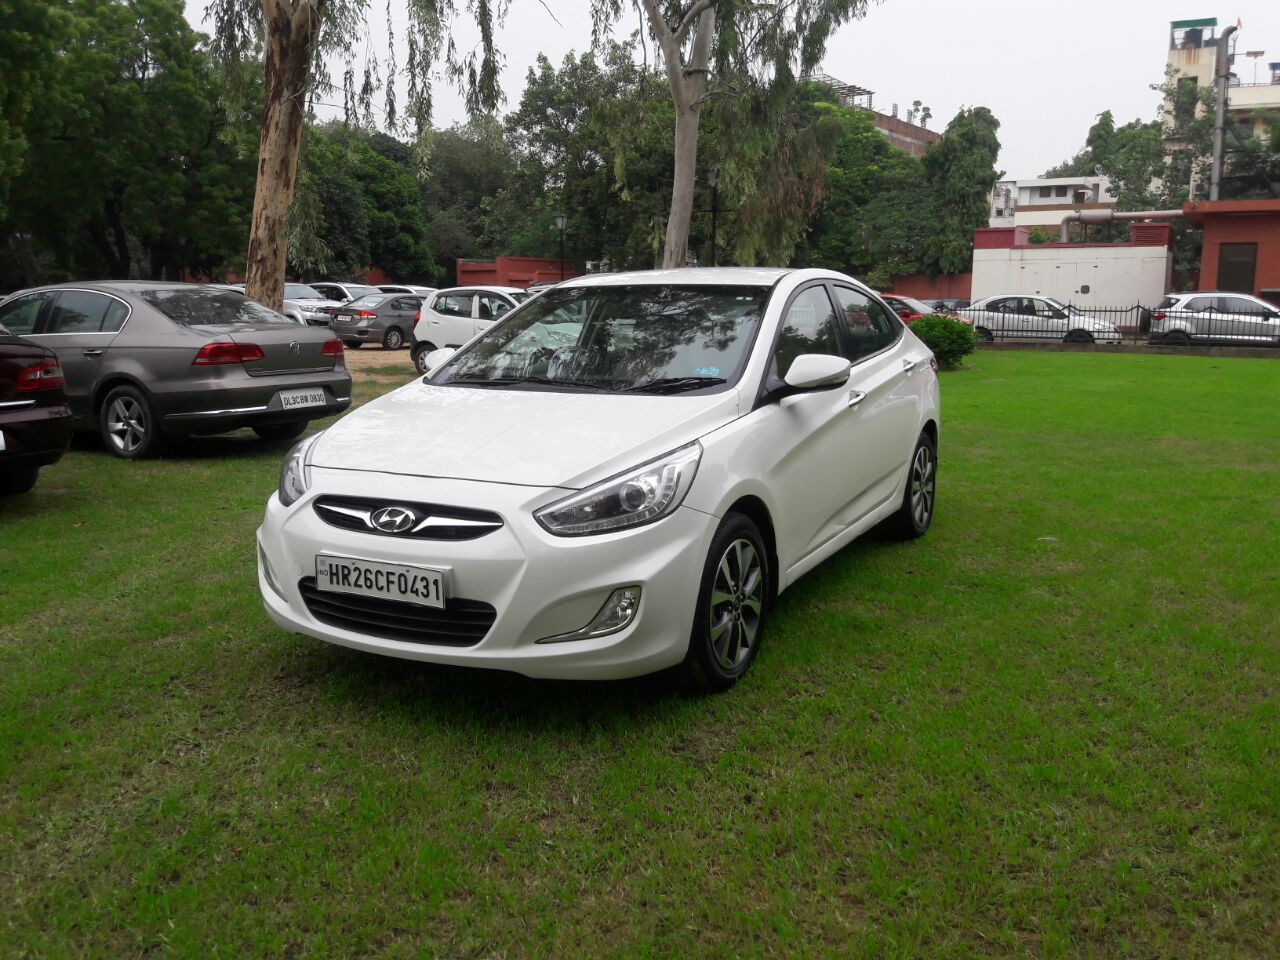 Used Hyundai Verna In Delhi Used Cars In Delhi Mahindra First